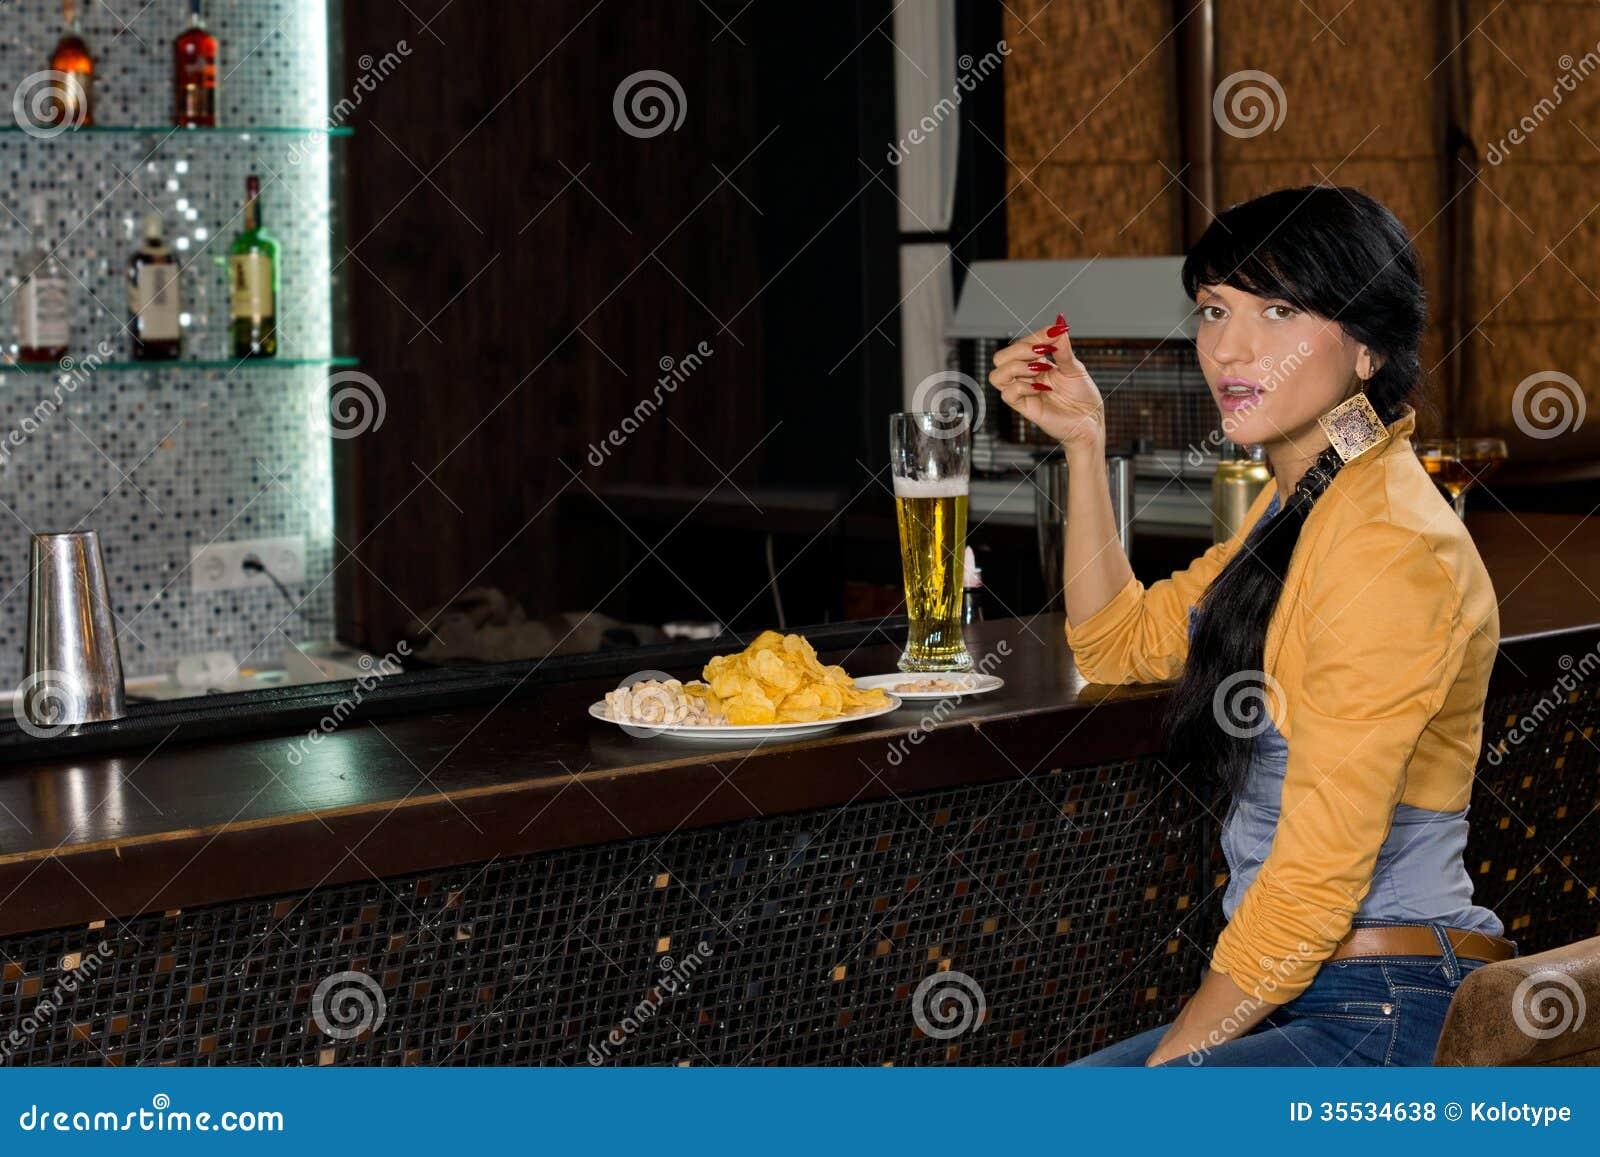 Stylish woman drinking alone at the bar counter